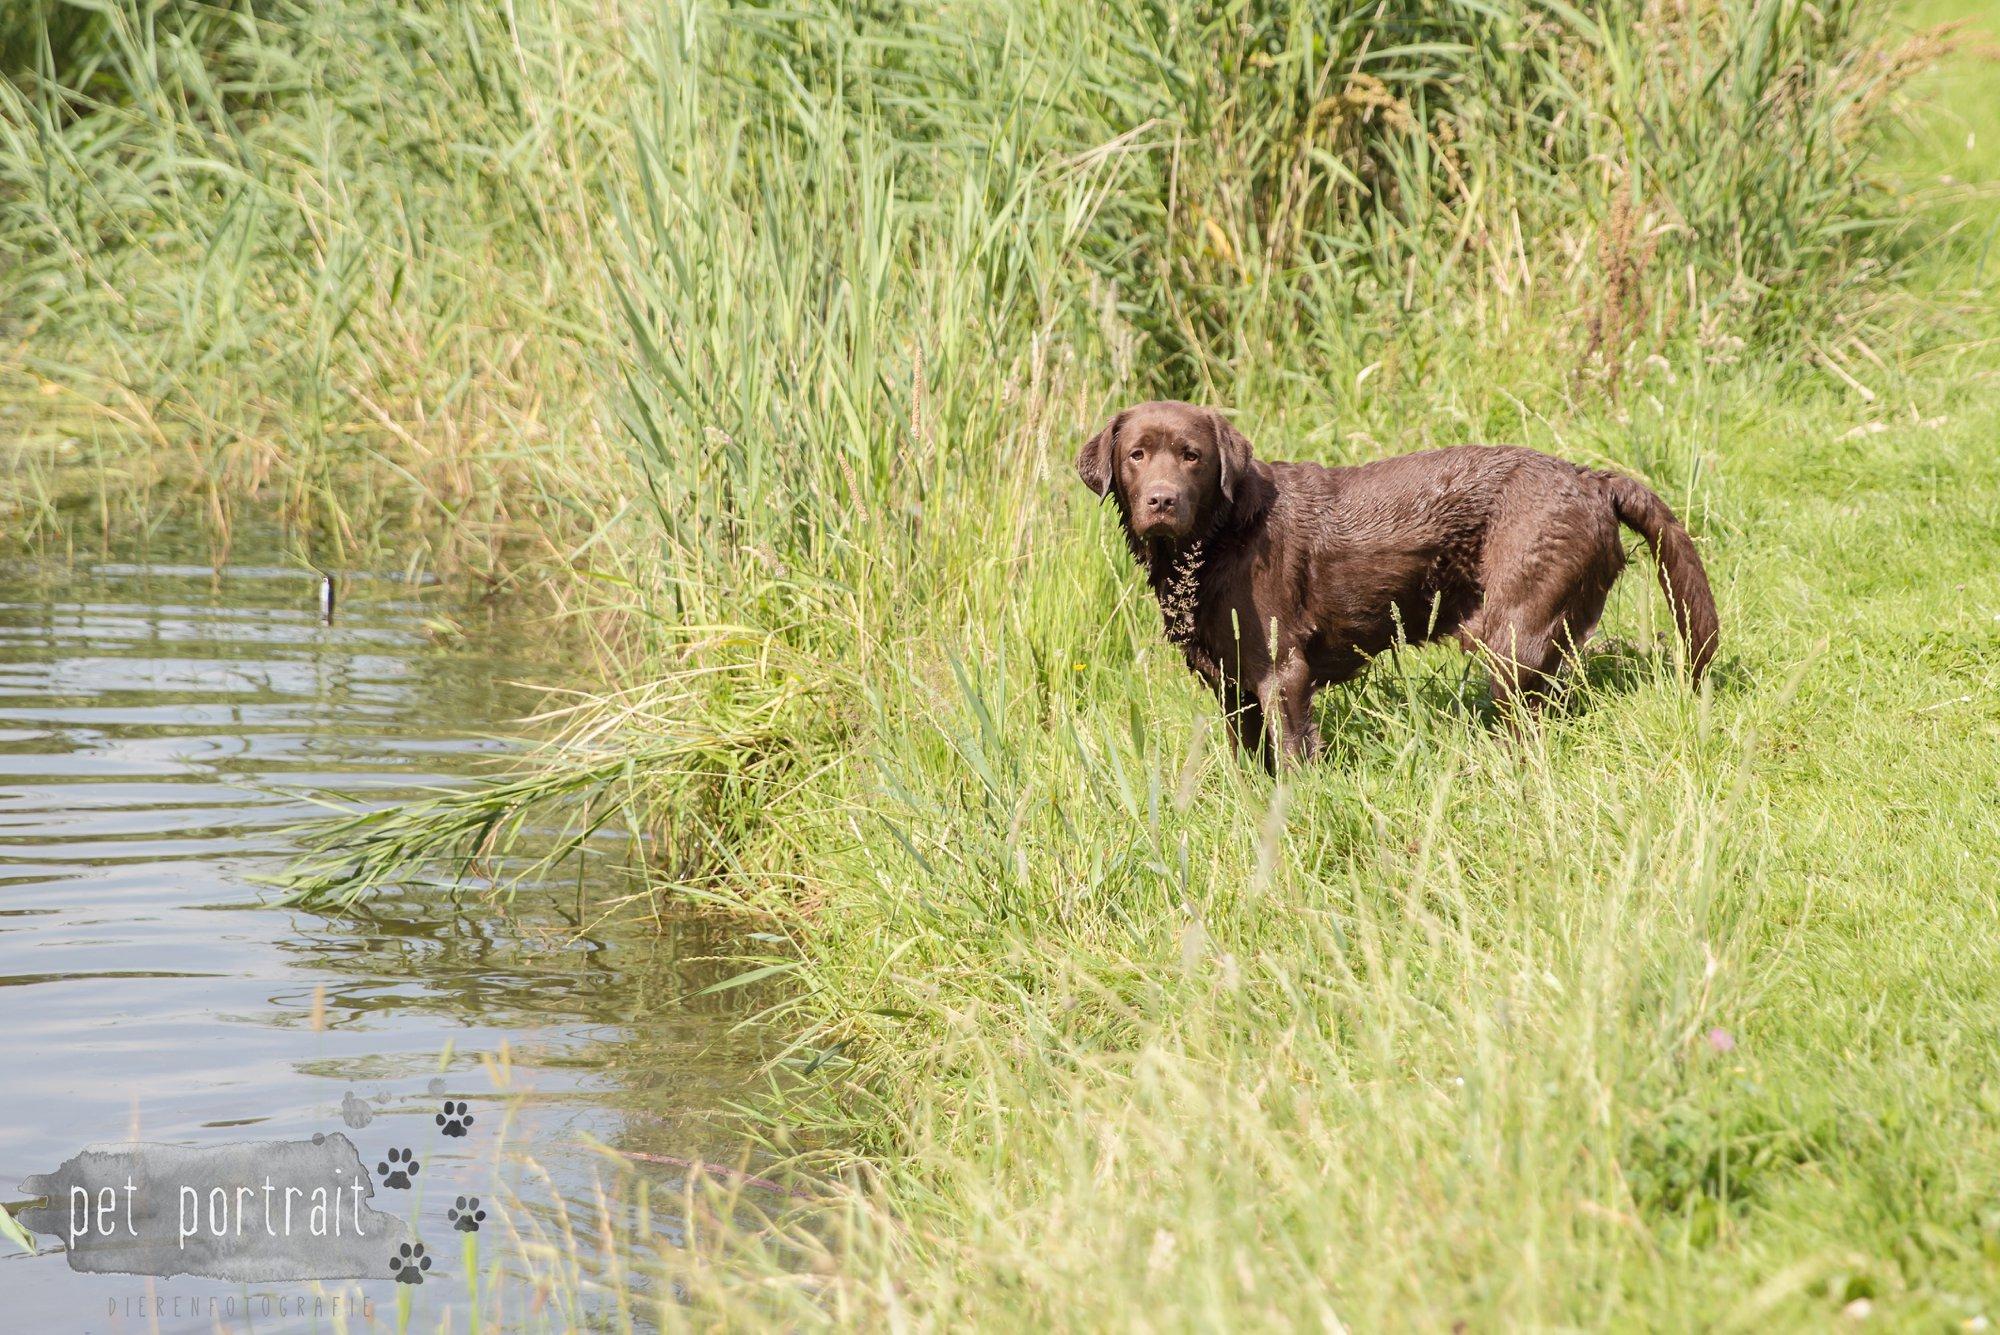 Hondenfotograaf Lelystad - Beloved Dier en Baasje fotoshoot-16